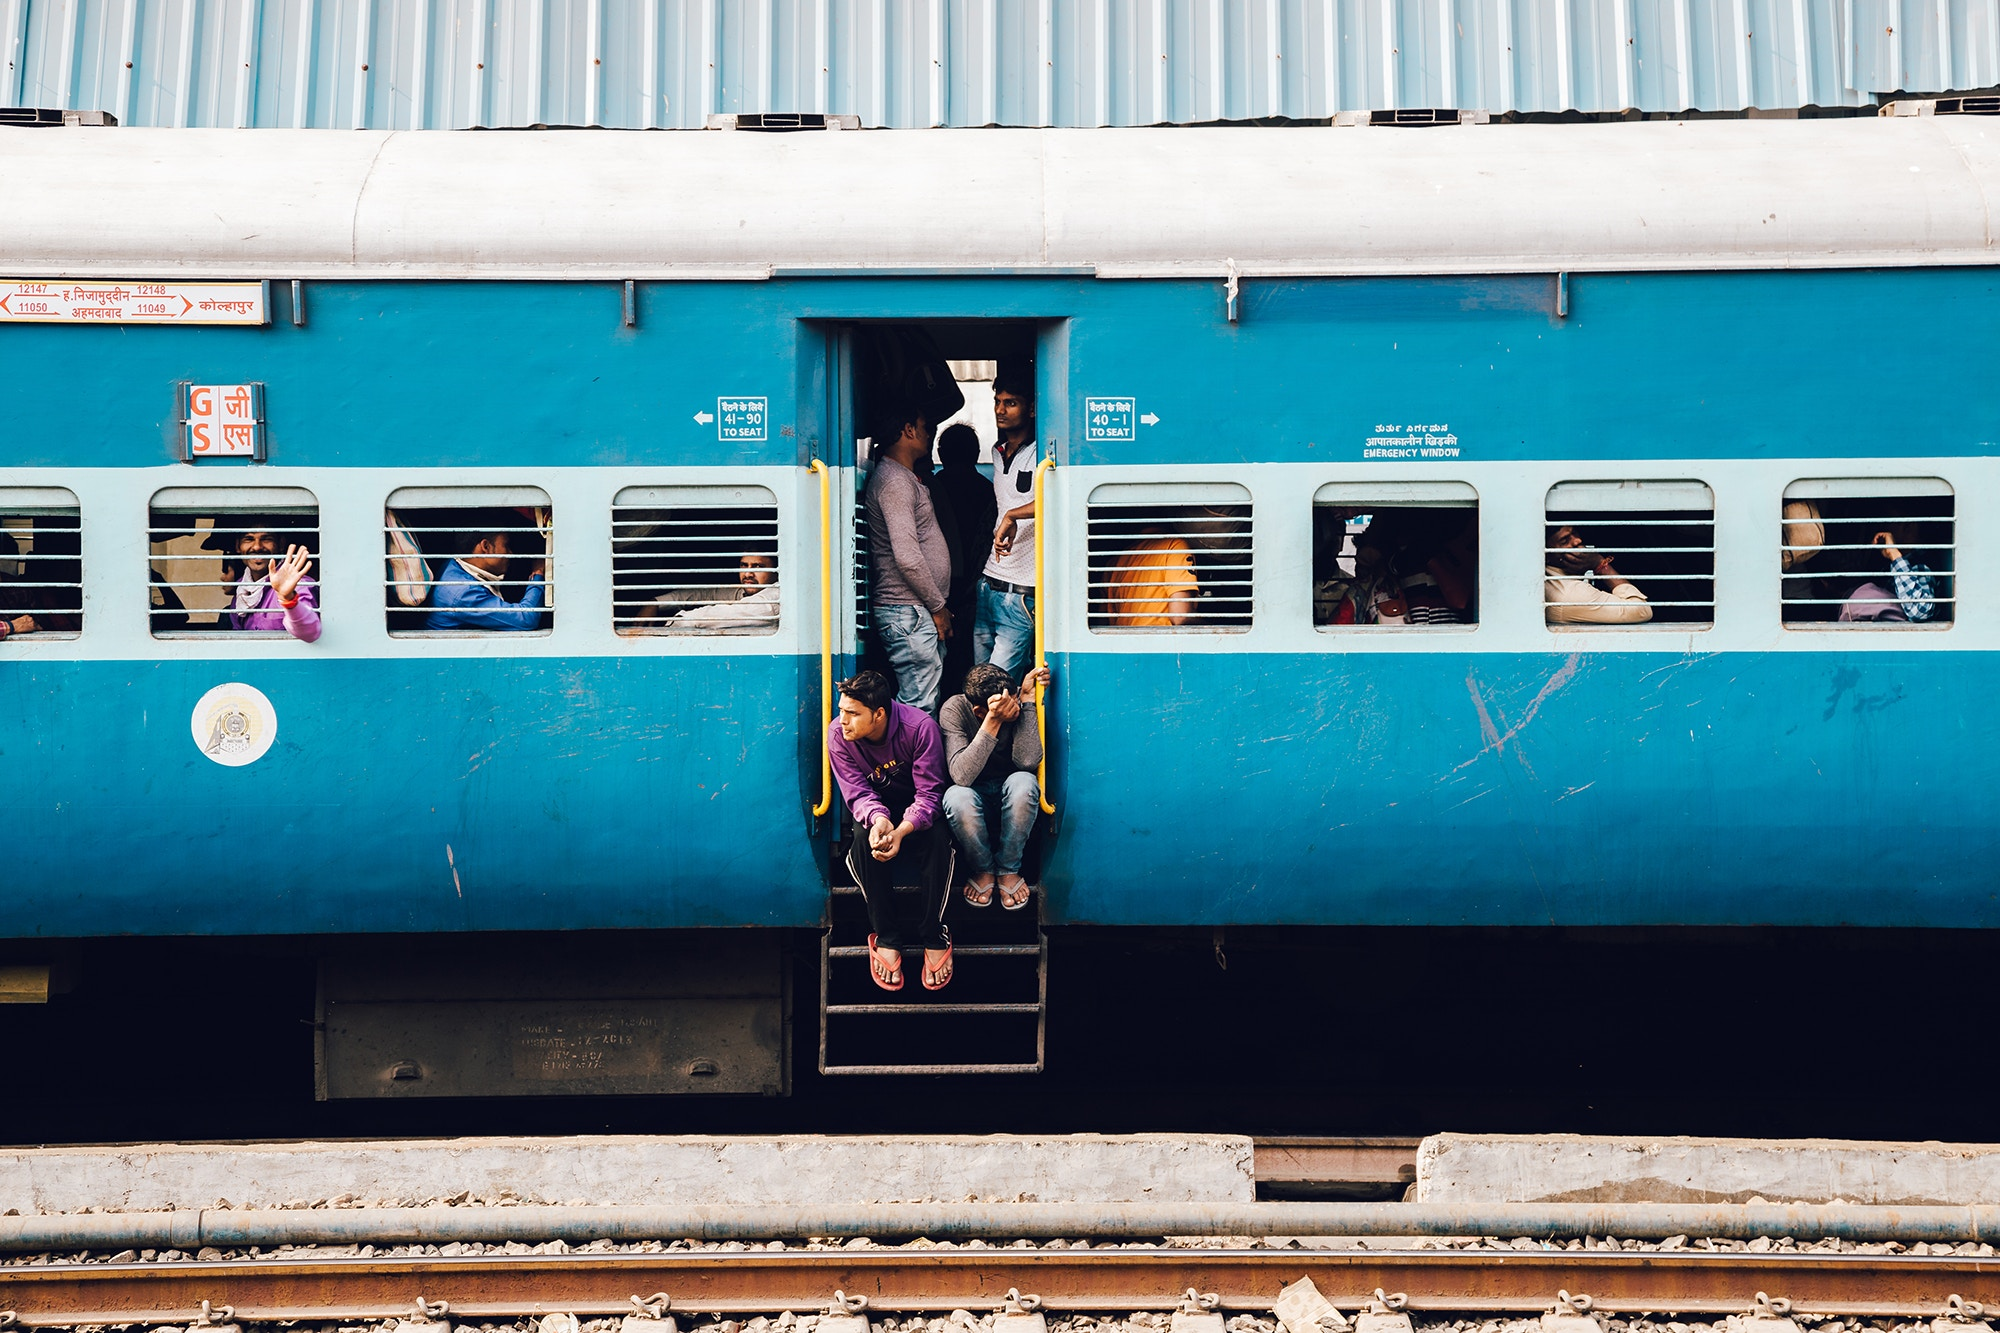 Passengers in the doorway of an Indian train